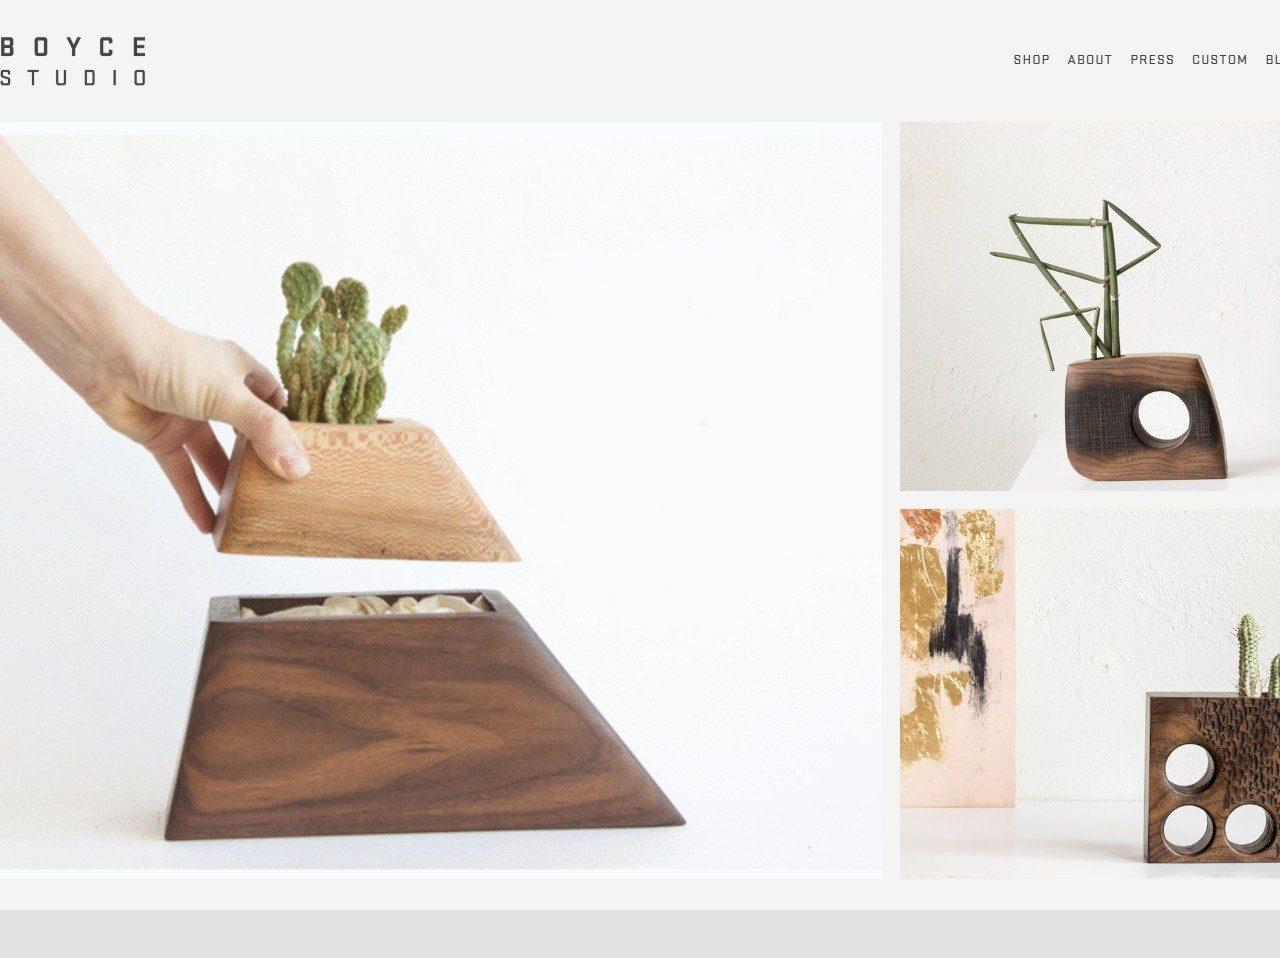 Boyce Studio planters Handmadde in LA